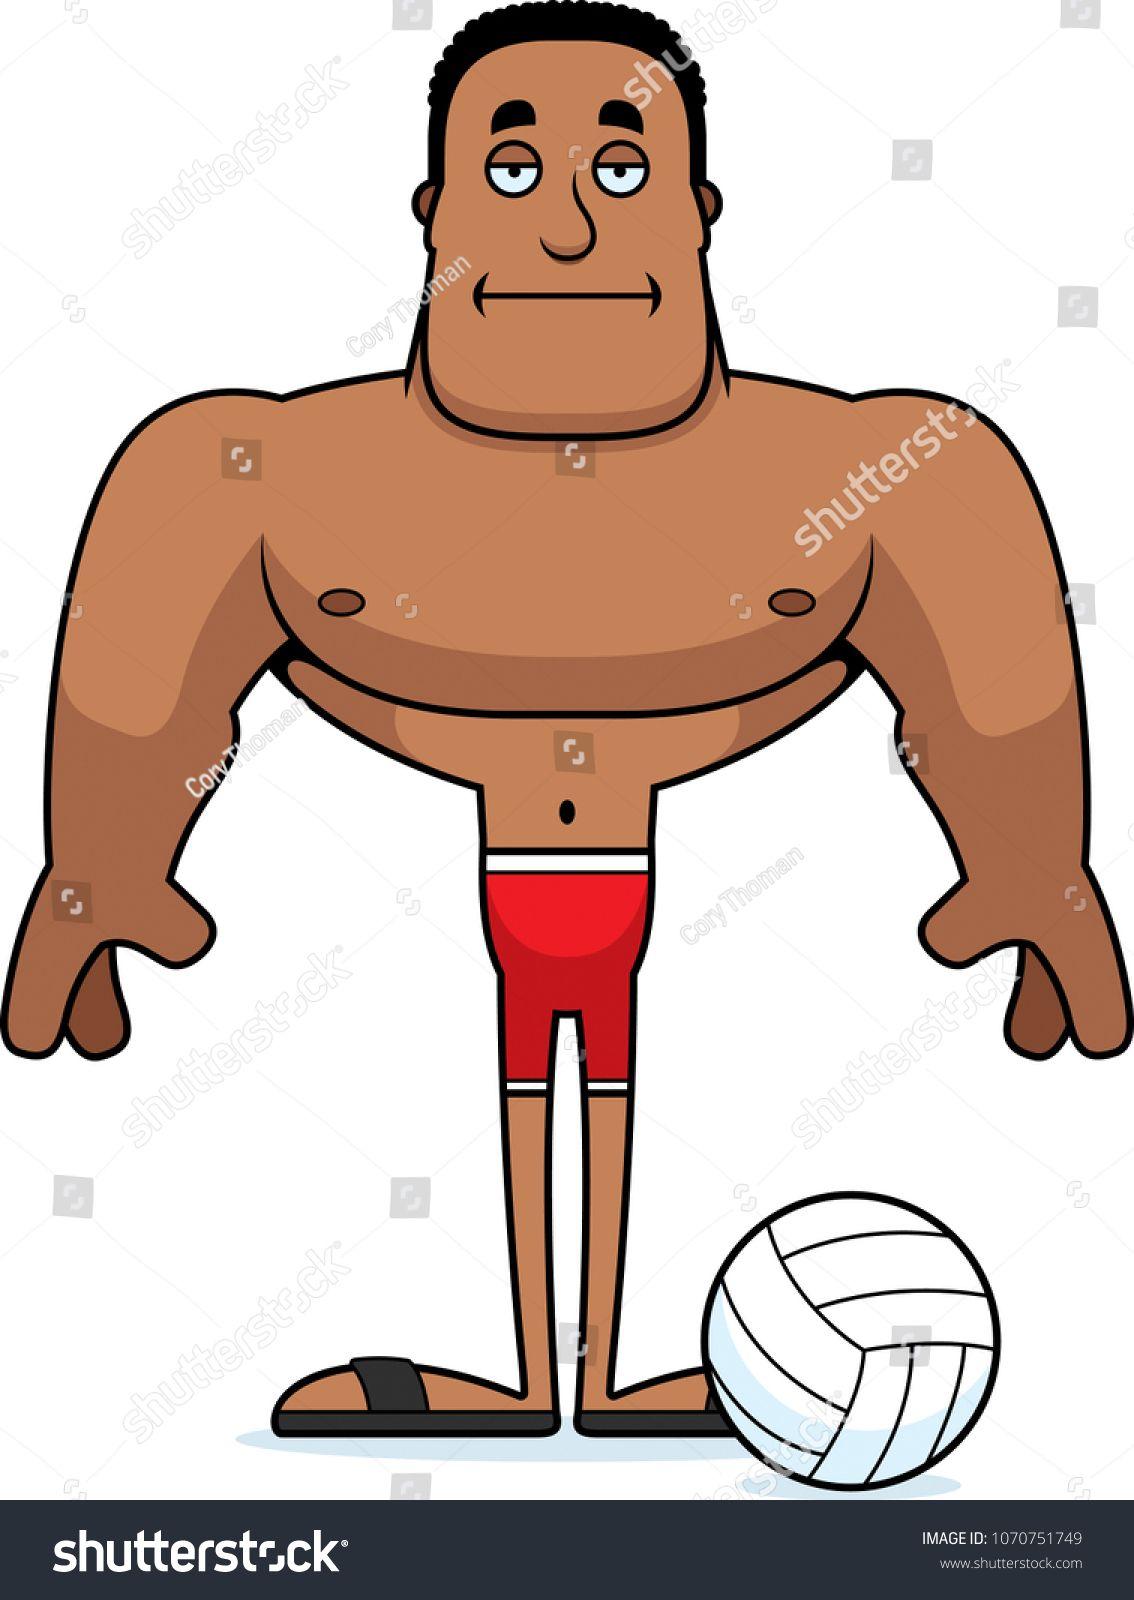 A cartoon beach volleyball player looking bored. #Ad , #ad, #beach#cartoon#volleyball#bored